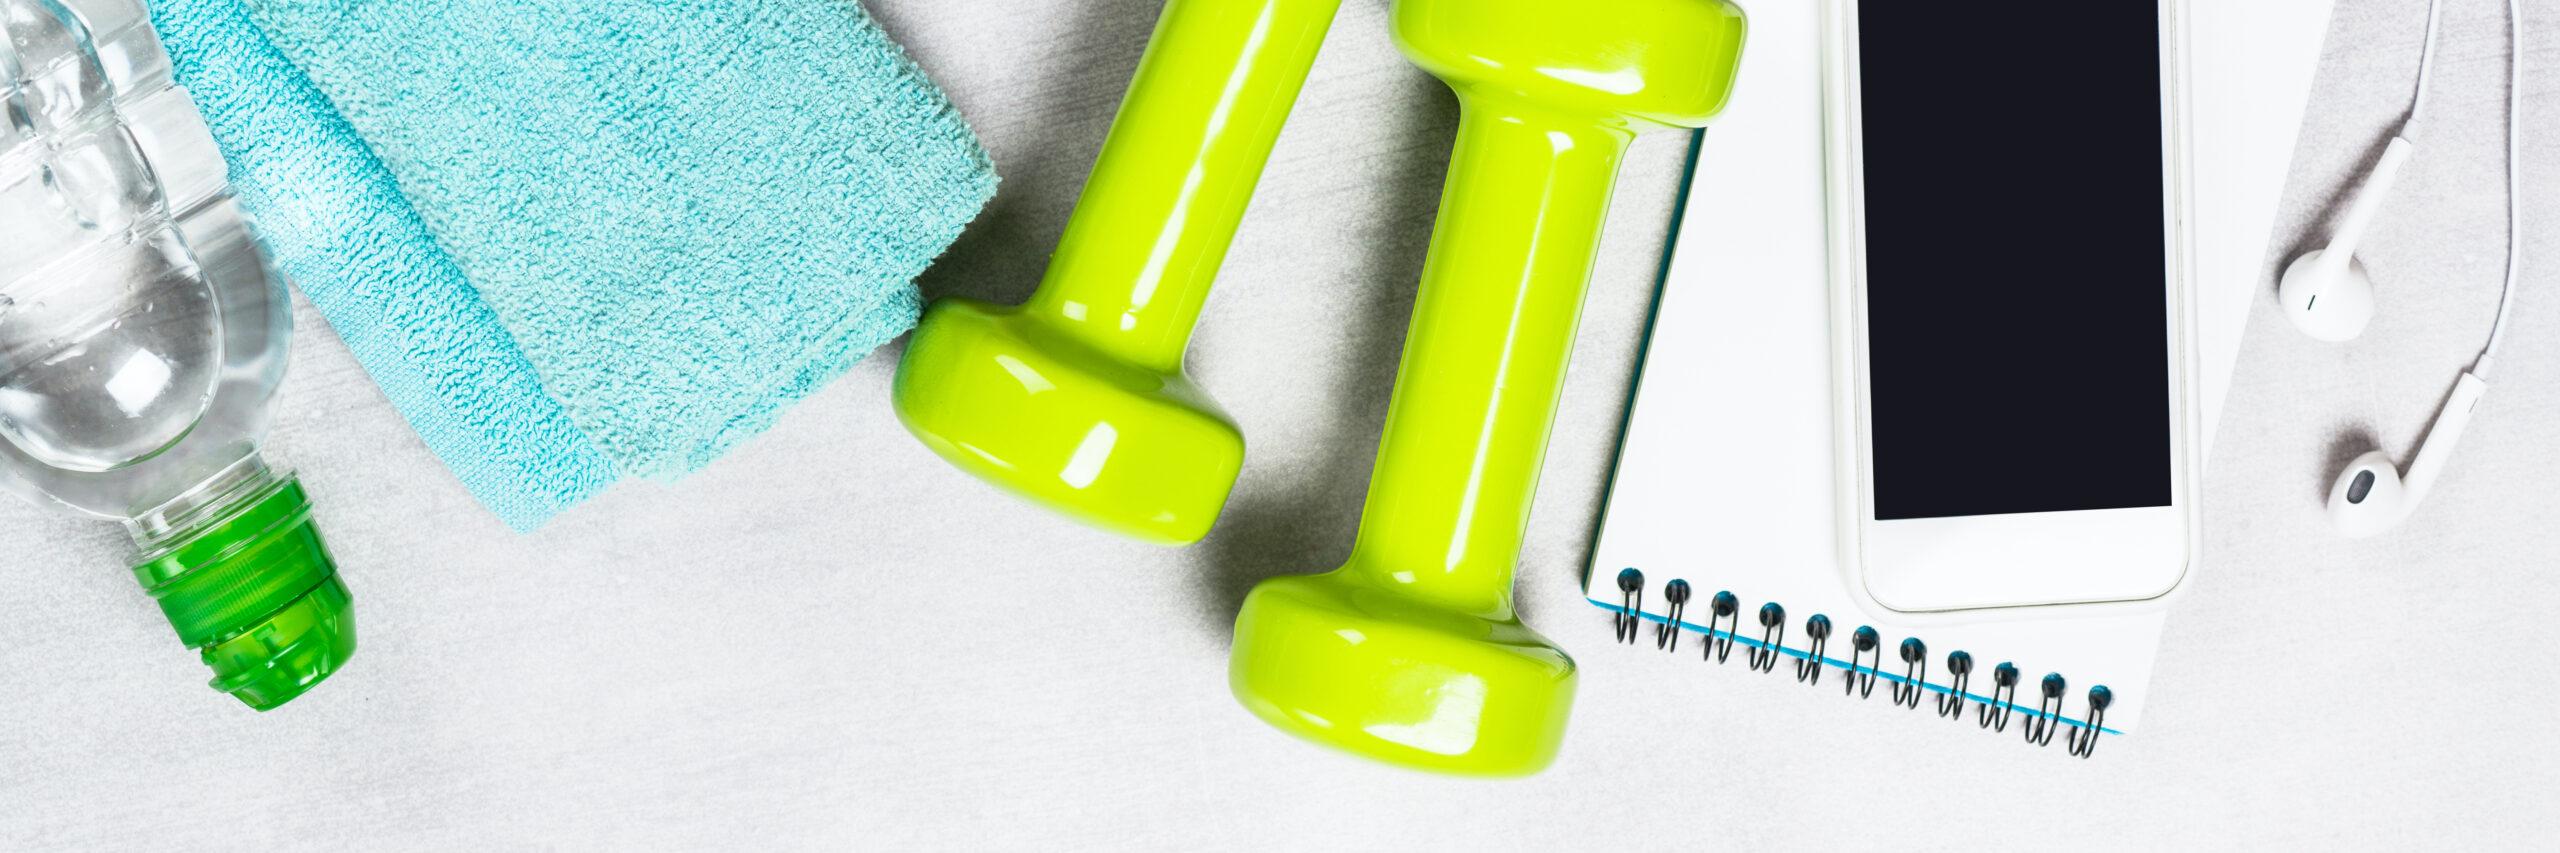 5 Day Healthy Habit Challenge